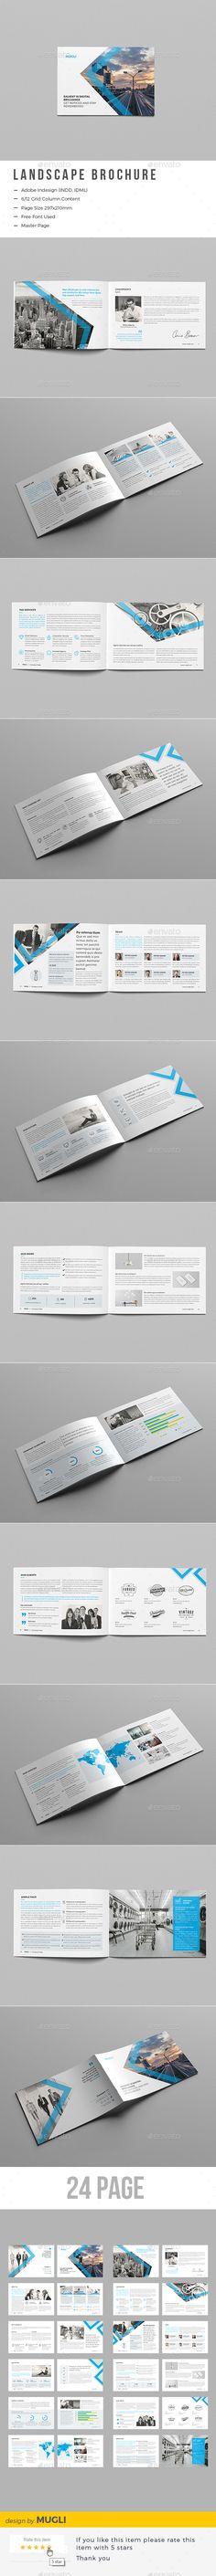 Business Brochure Template InDesign INDD. Download here: http://graphicriver.net/item/business-brochure/15539125?ref=ksioks